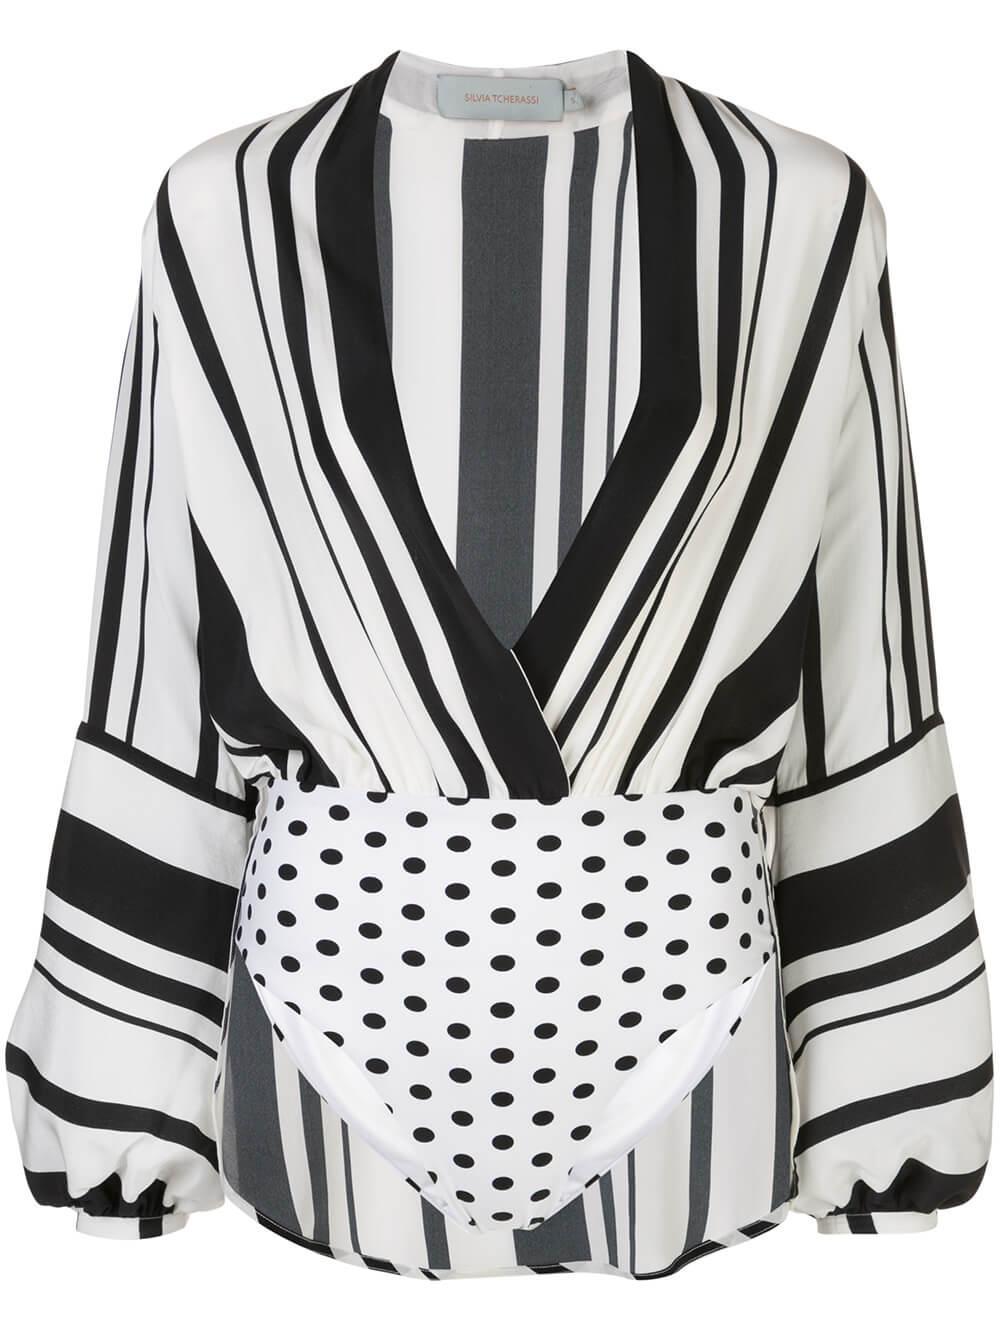 Hilda Long Sleeve Striped Top Item # HILDA-TOP